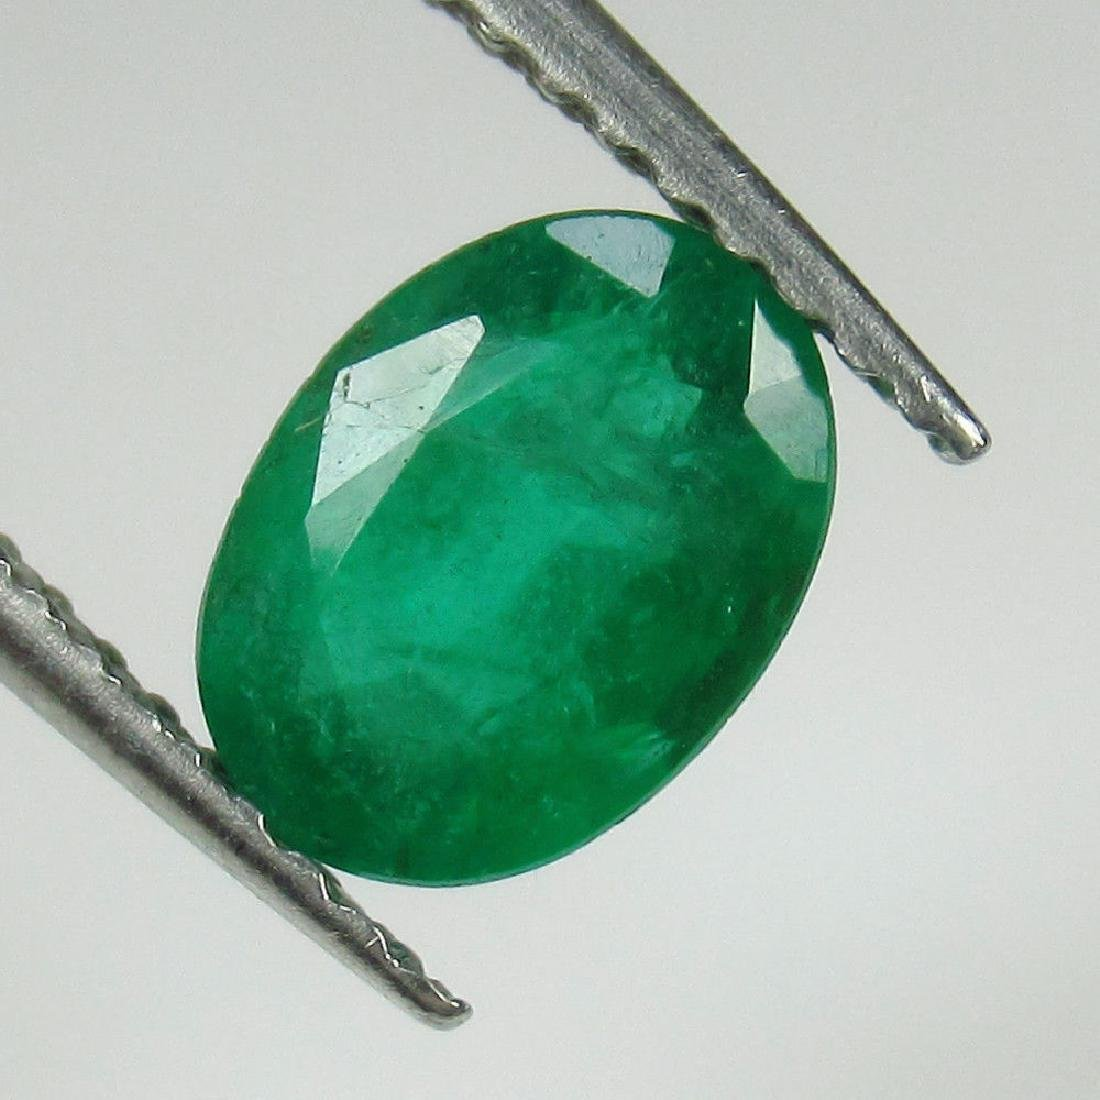 1.04 Ct Genuine Zambian Emerald 7.5X5.5 mm Oval Cut